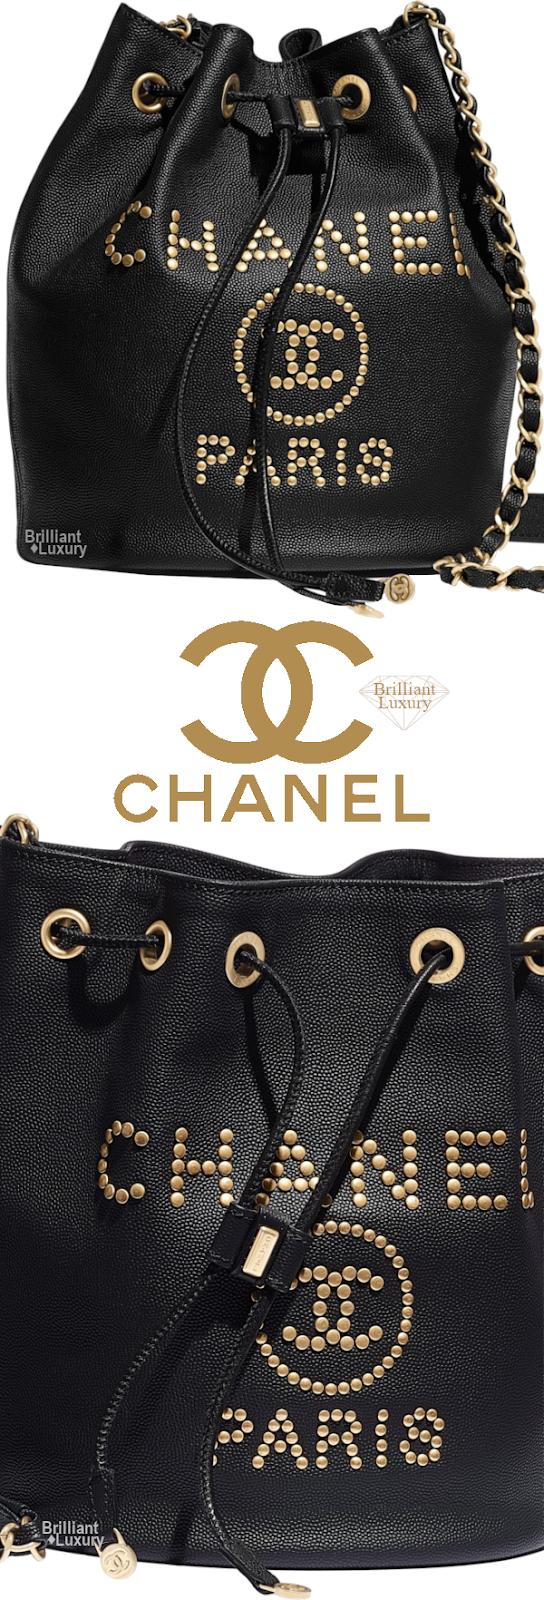 Brilliant Luxury♦Chanel Studded Drawstring Bag #black #gold #accessories